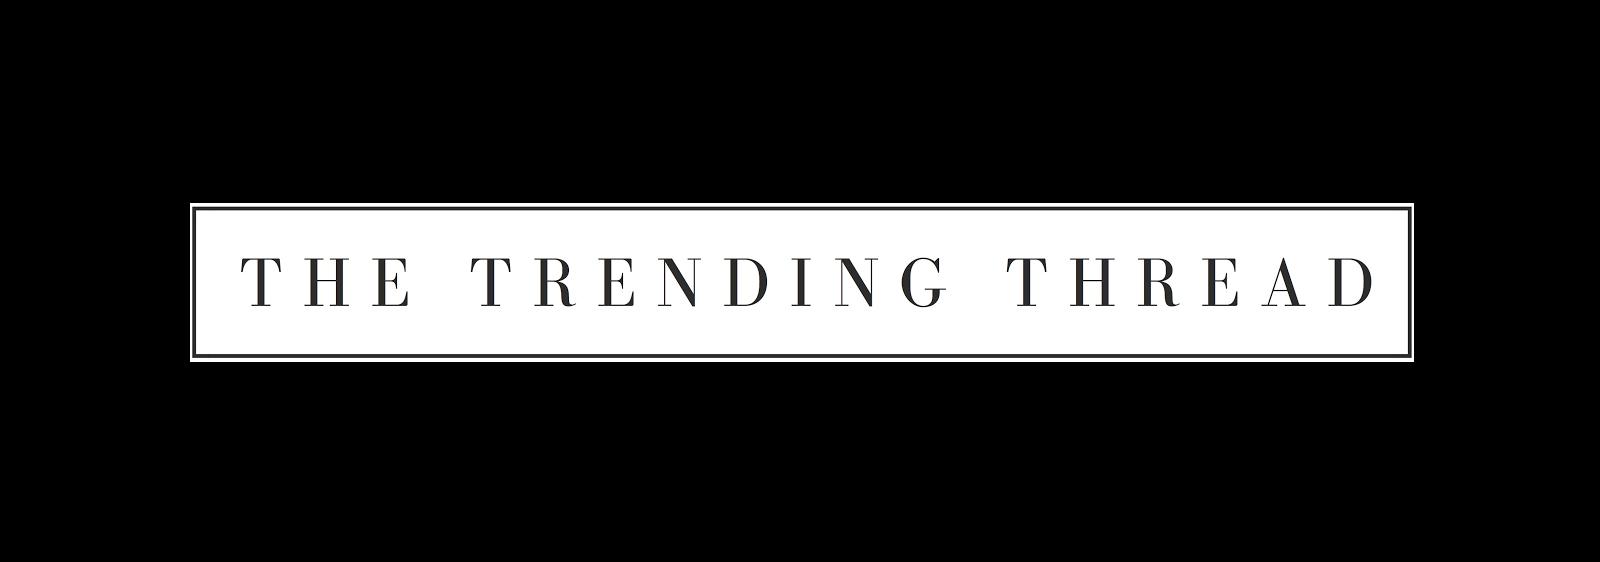 the trending thread